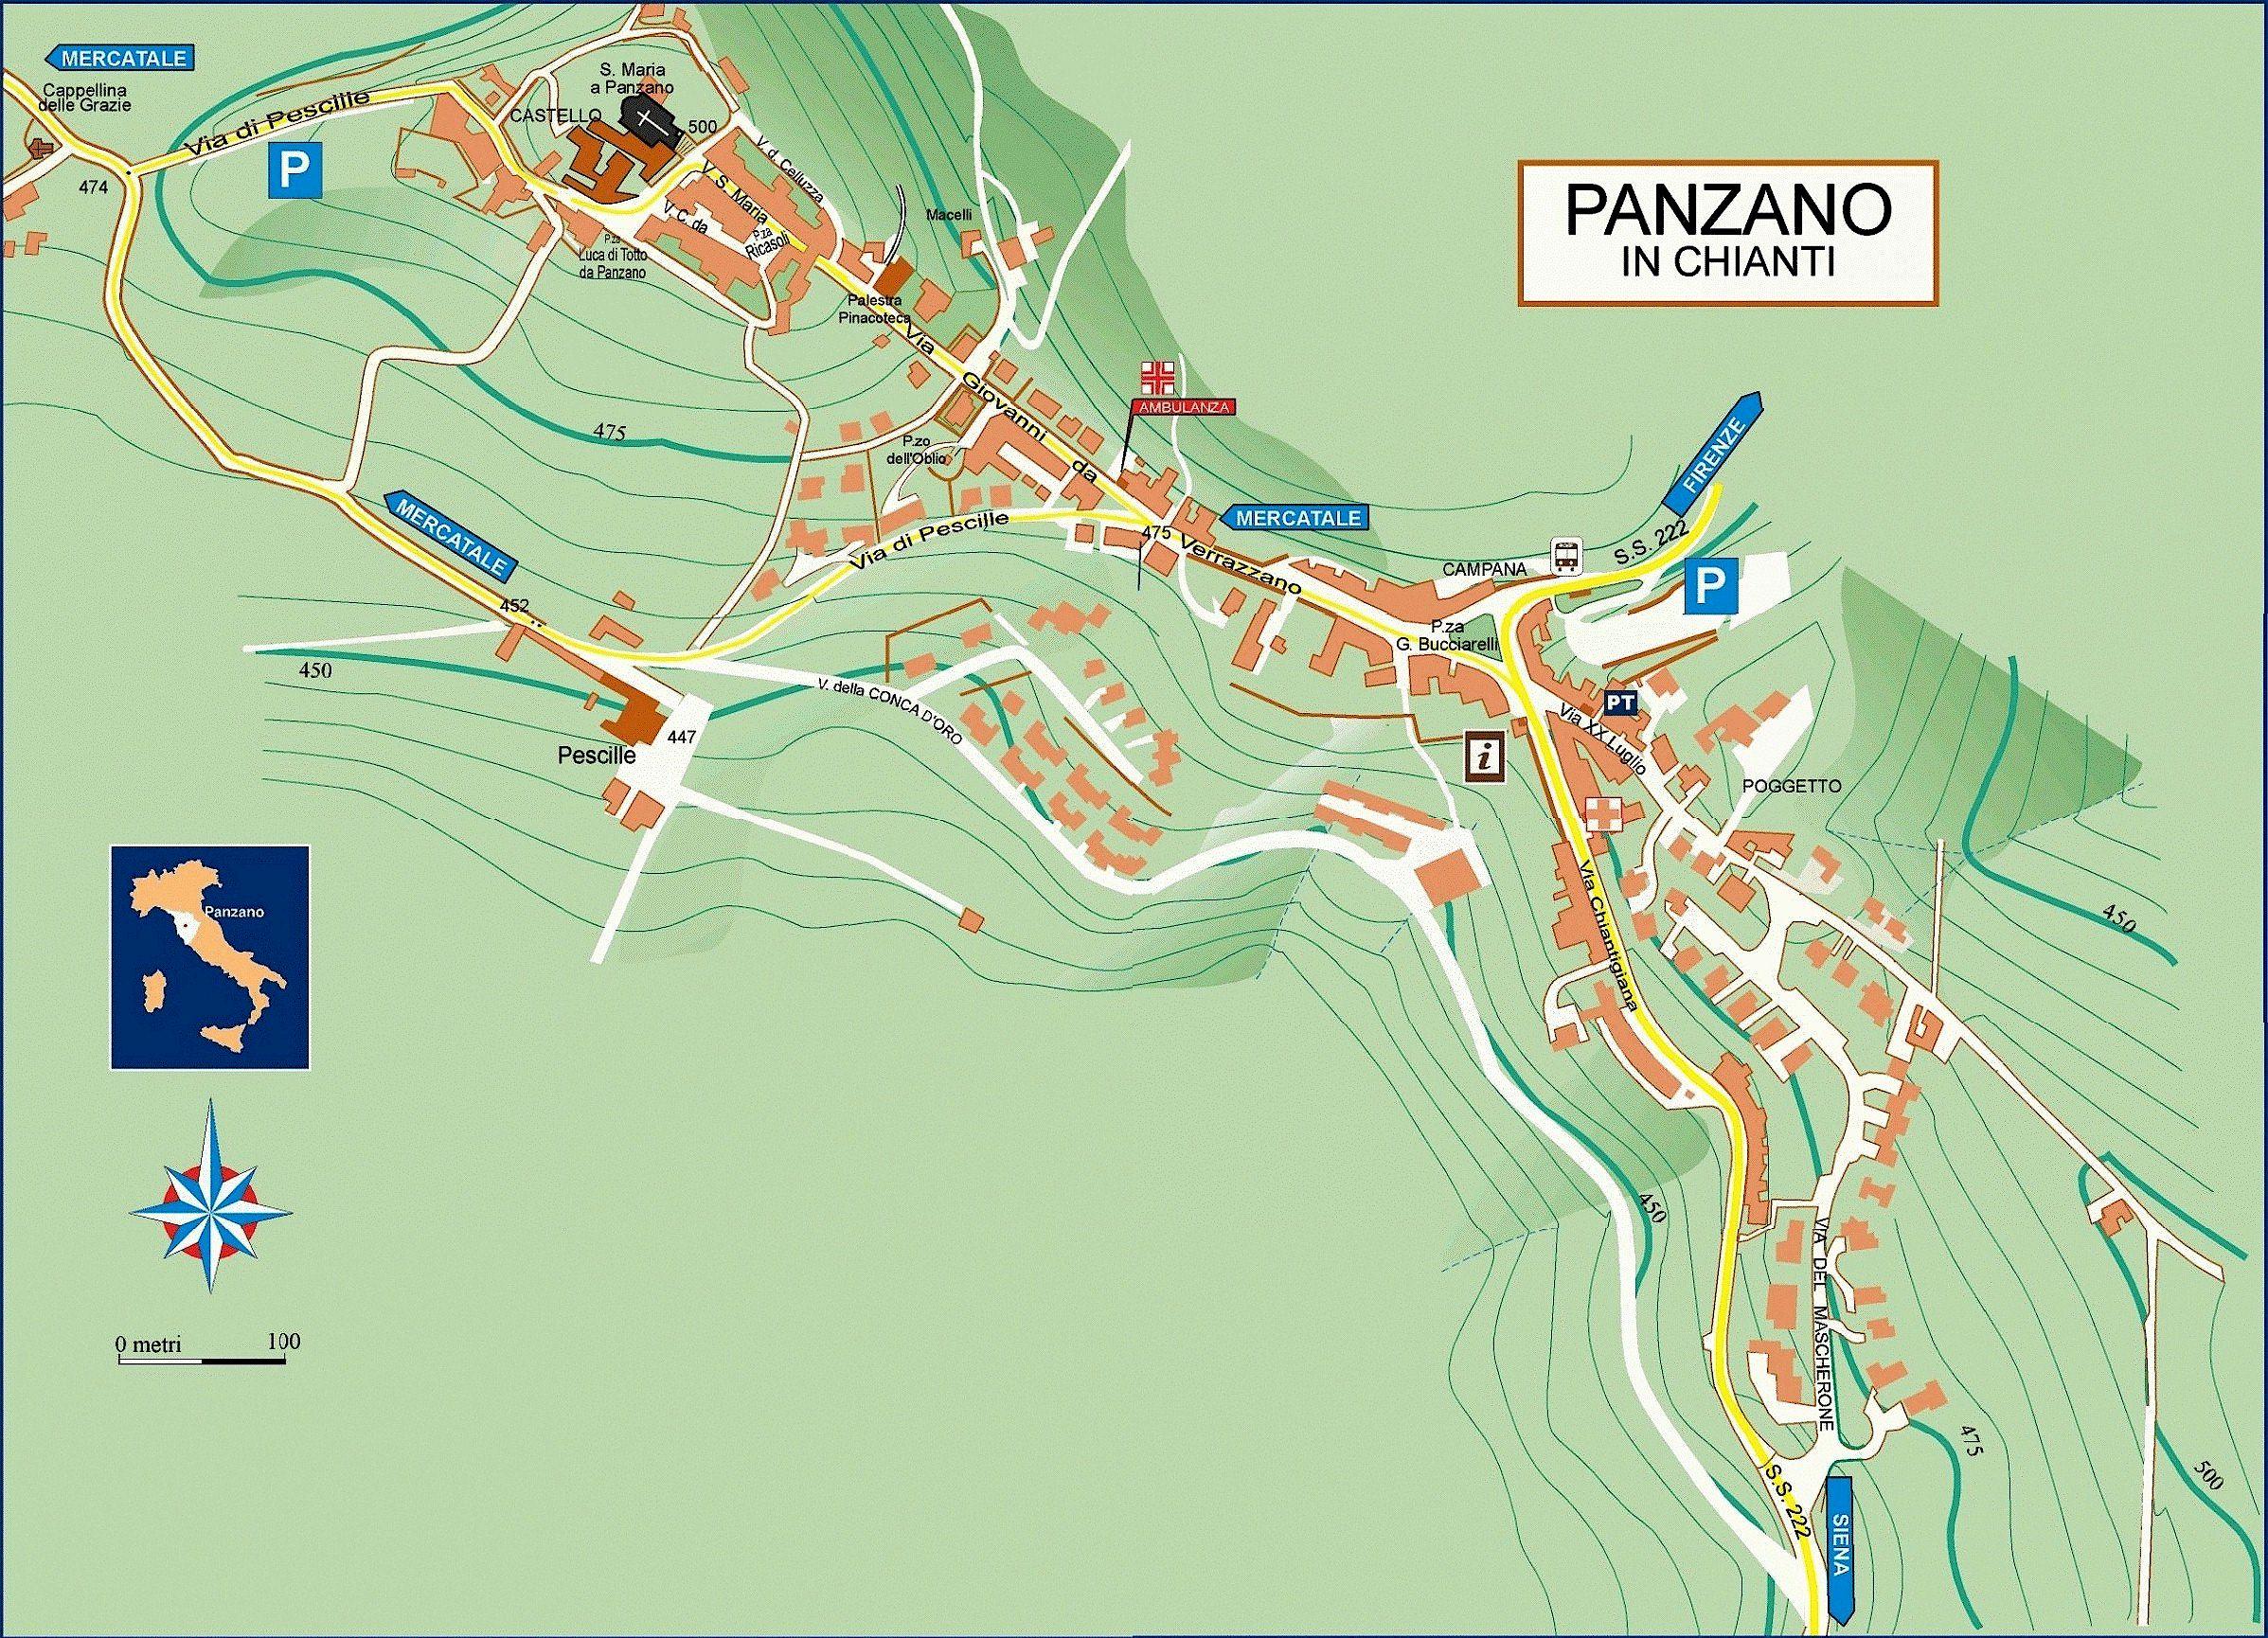 Street map of Panzano in Chianti